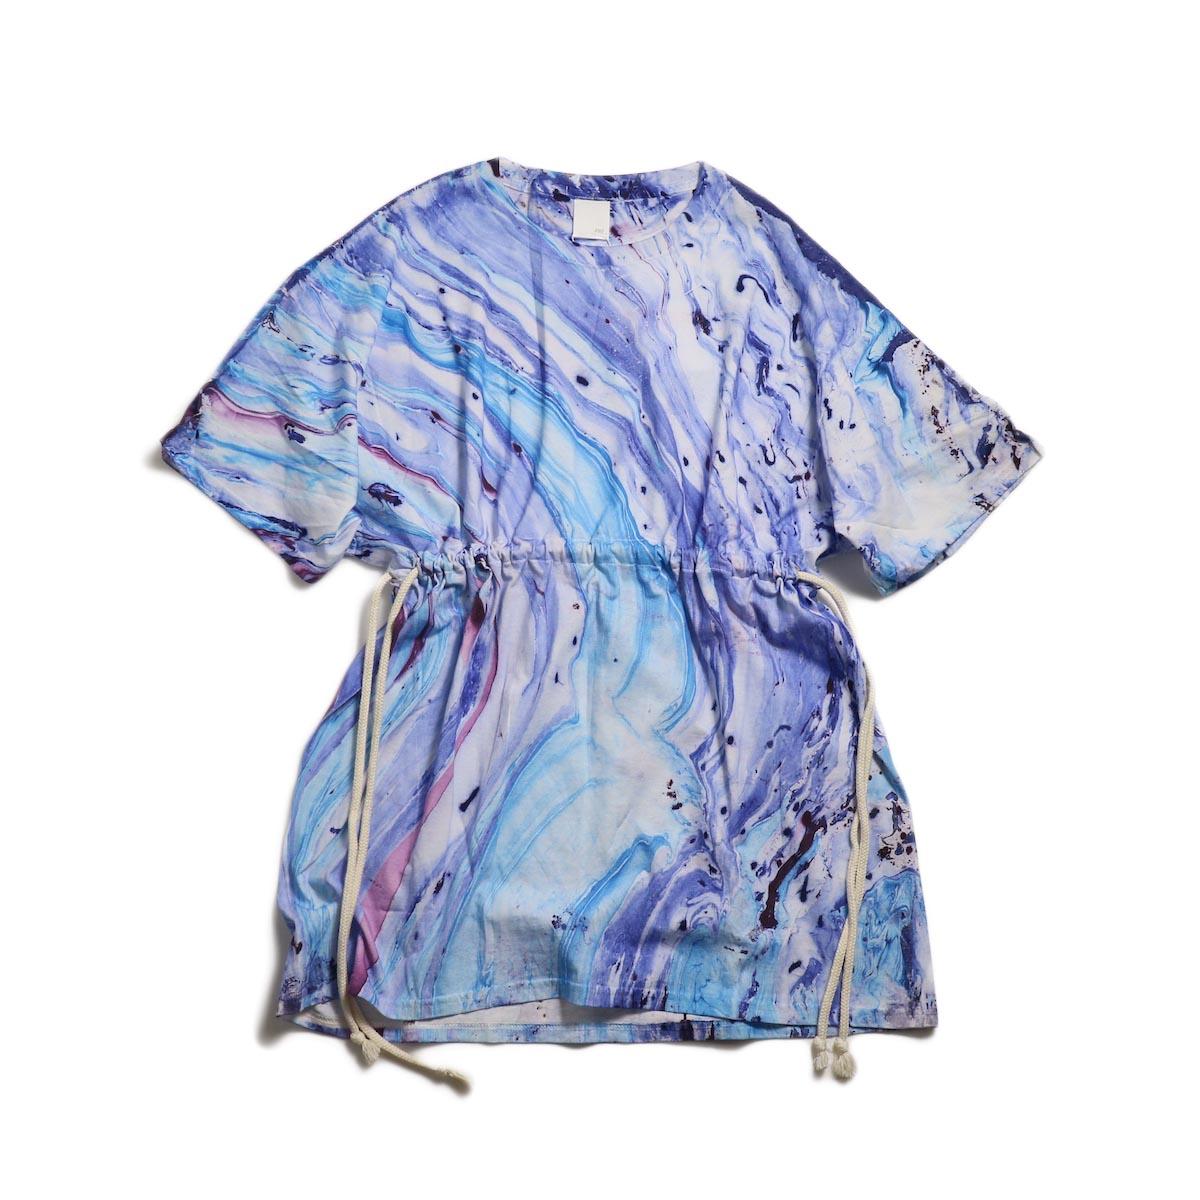 PRE_ Marble Tye Dye Tee W / Drawcord for W -M.10